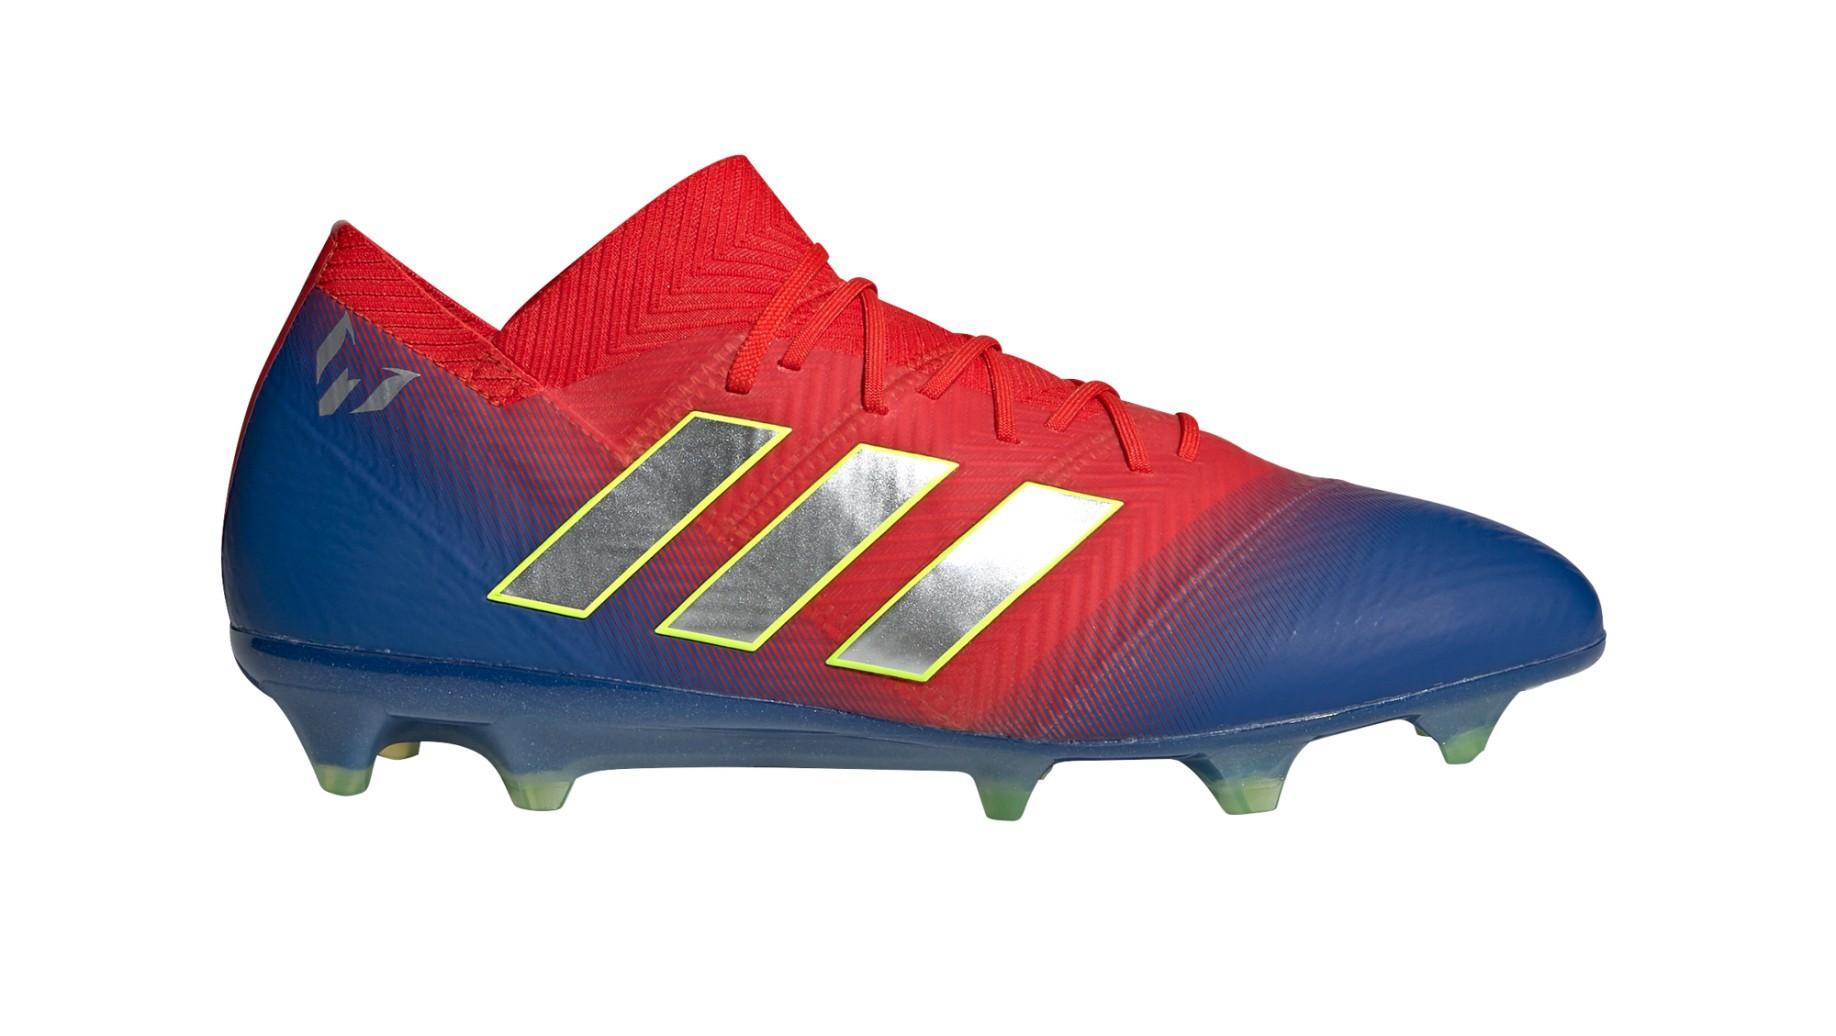 Scarpe Calcio Adidas Nemeziz Messi 18.1 FG Initiator Pack